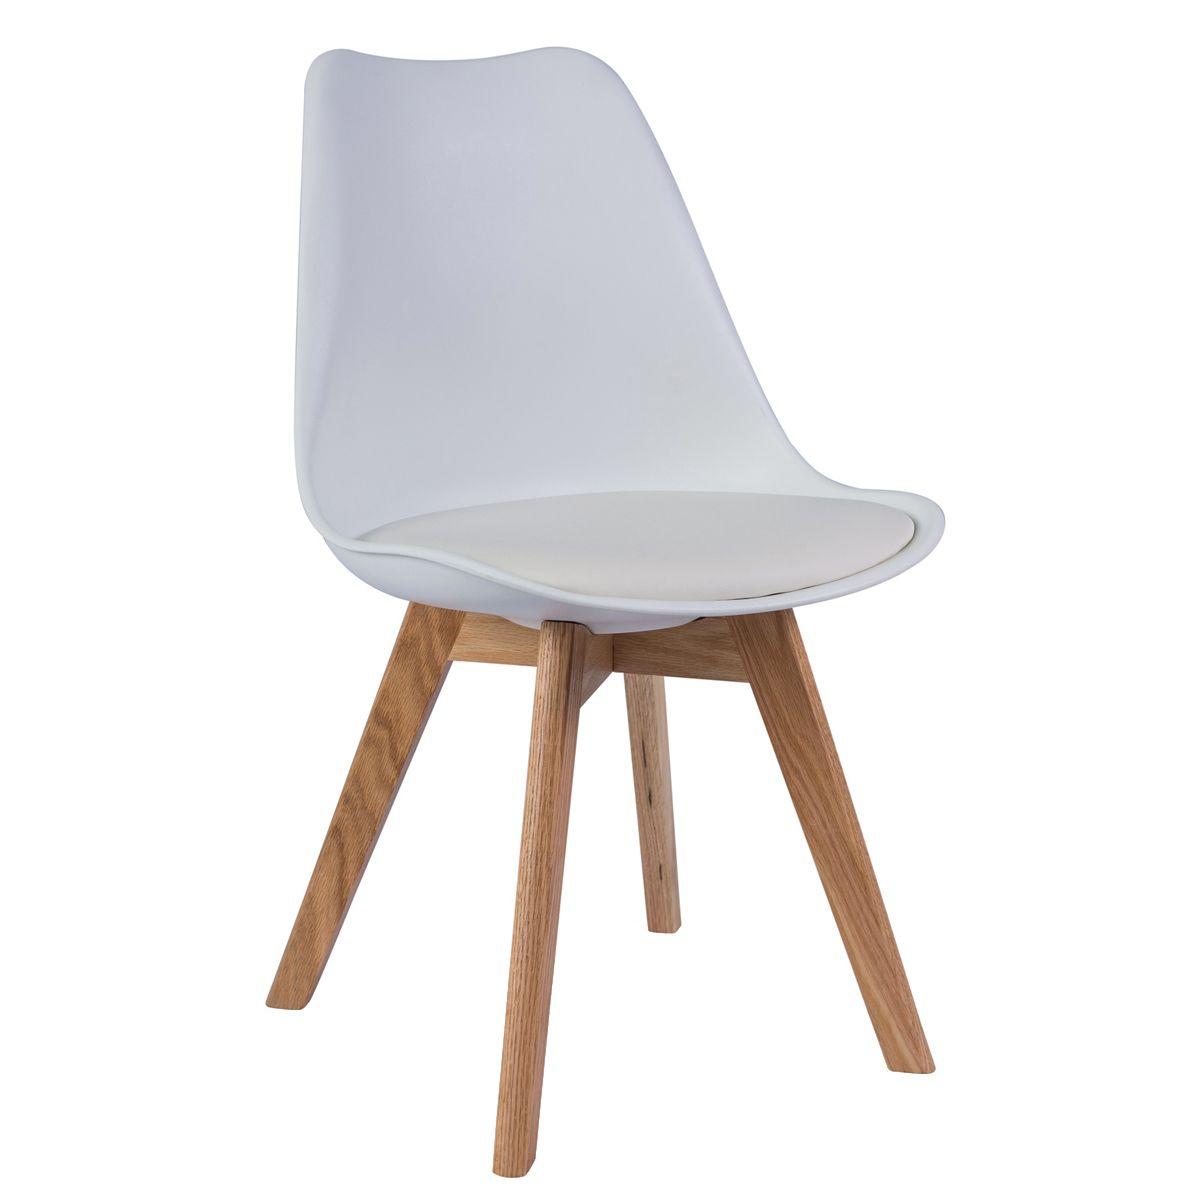 Schalenstuhl Stuhl Dijon Stuhl Retro Stuhle Und Stuhl Holz